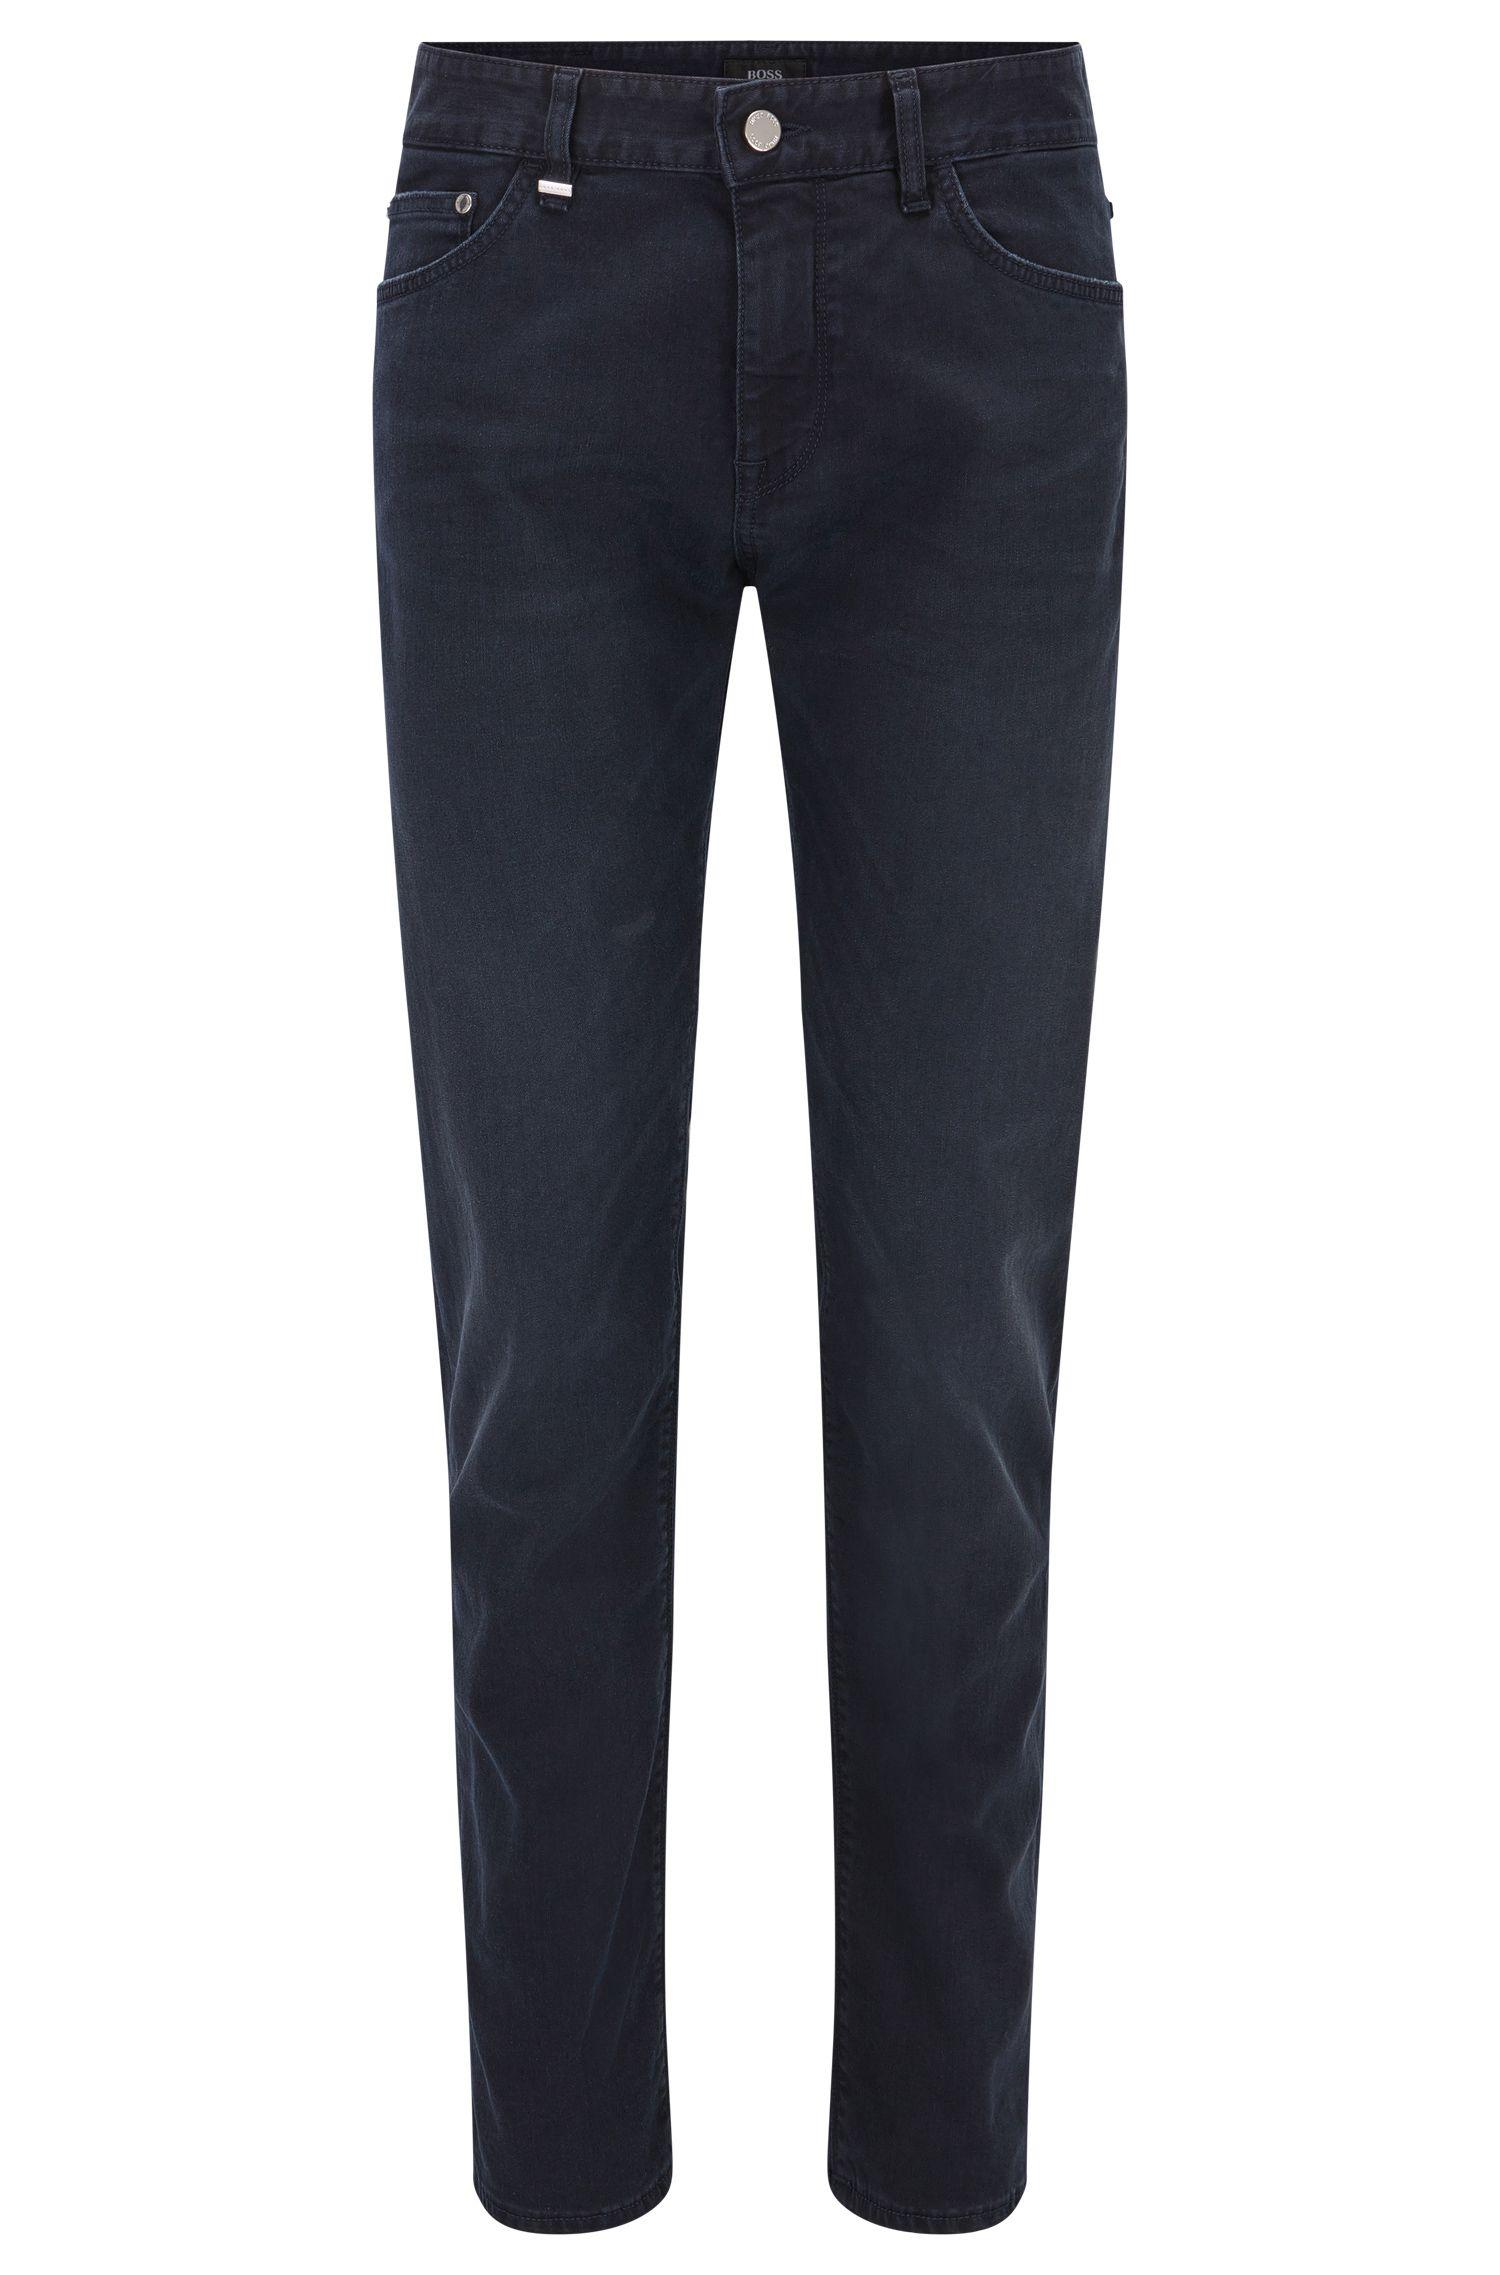 9.5 oz Stretch Cotton Blend Jeans, Regular Fit | Maine